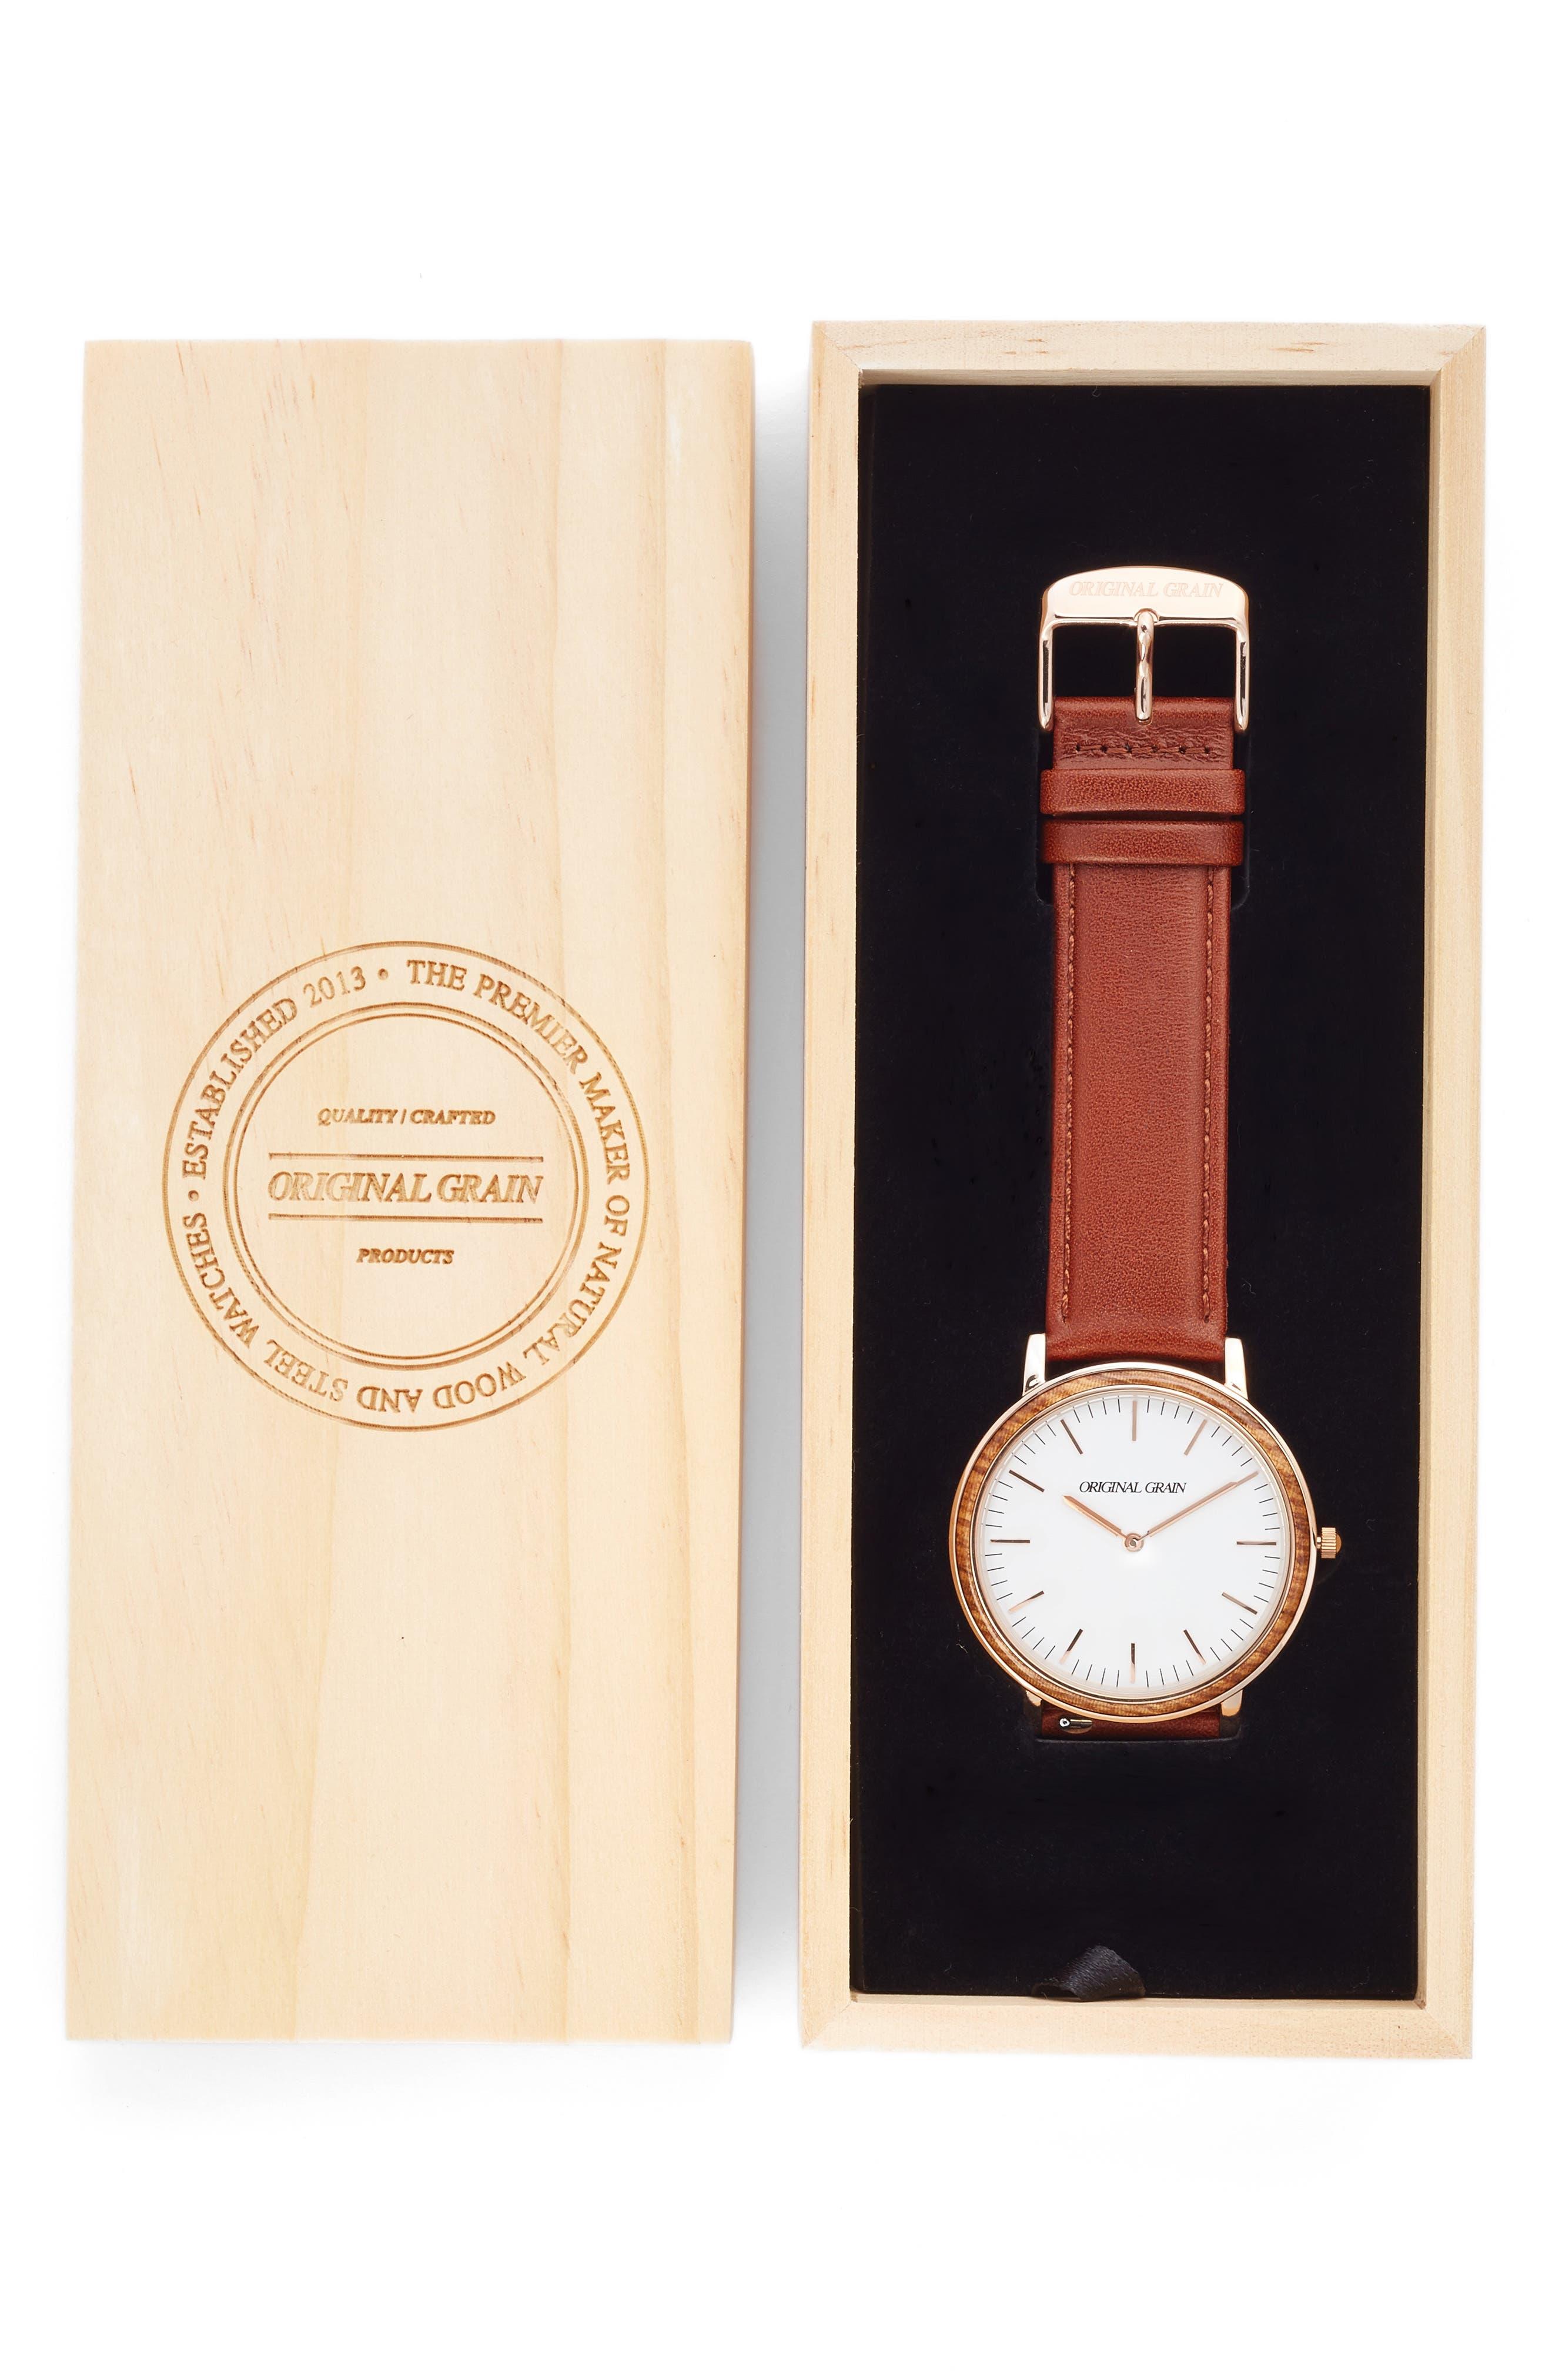 Alternate Image 4  - Original Grain Minimalist Leather Strap Watch, 40mm